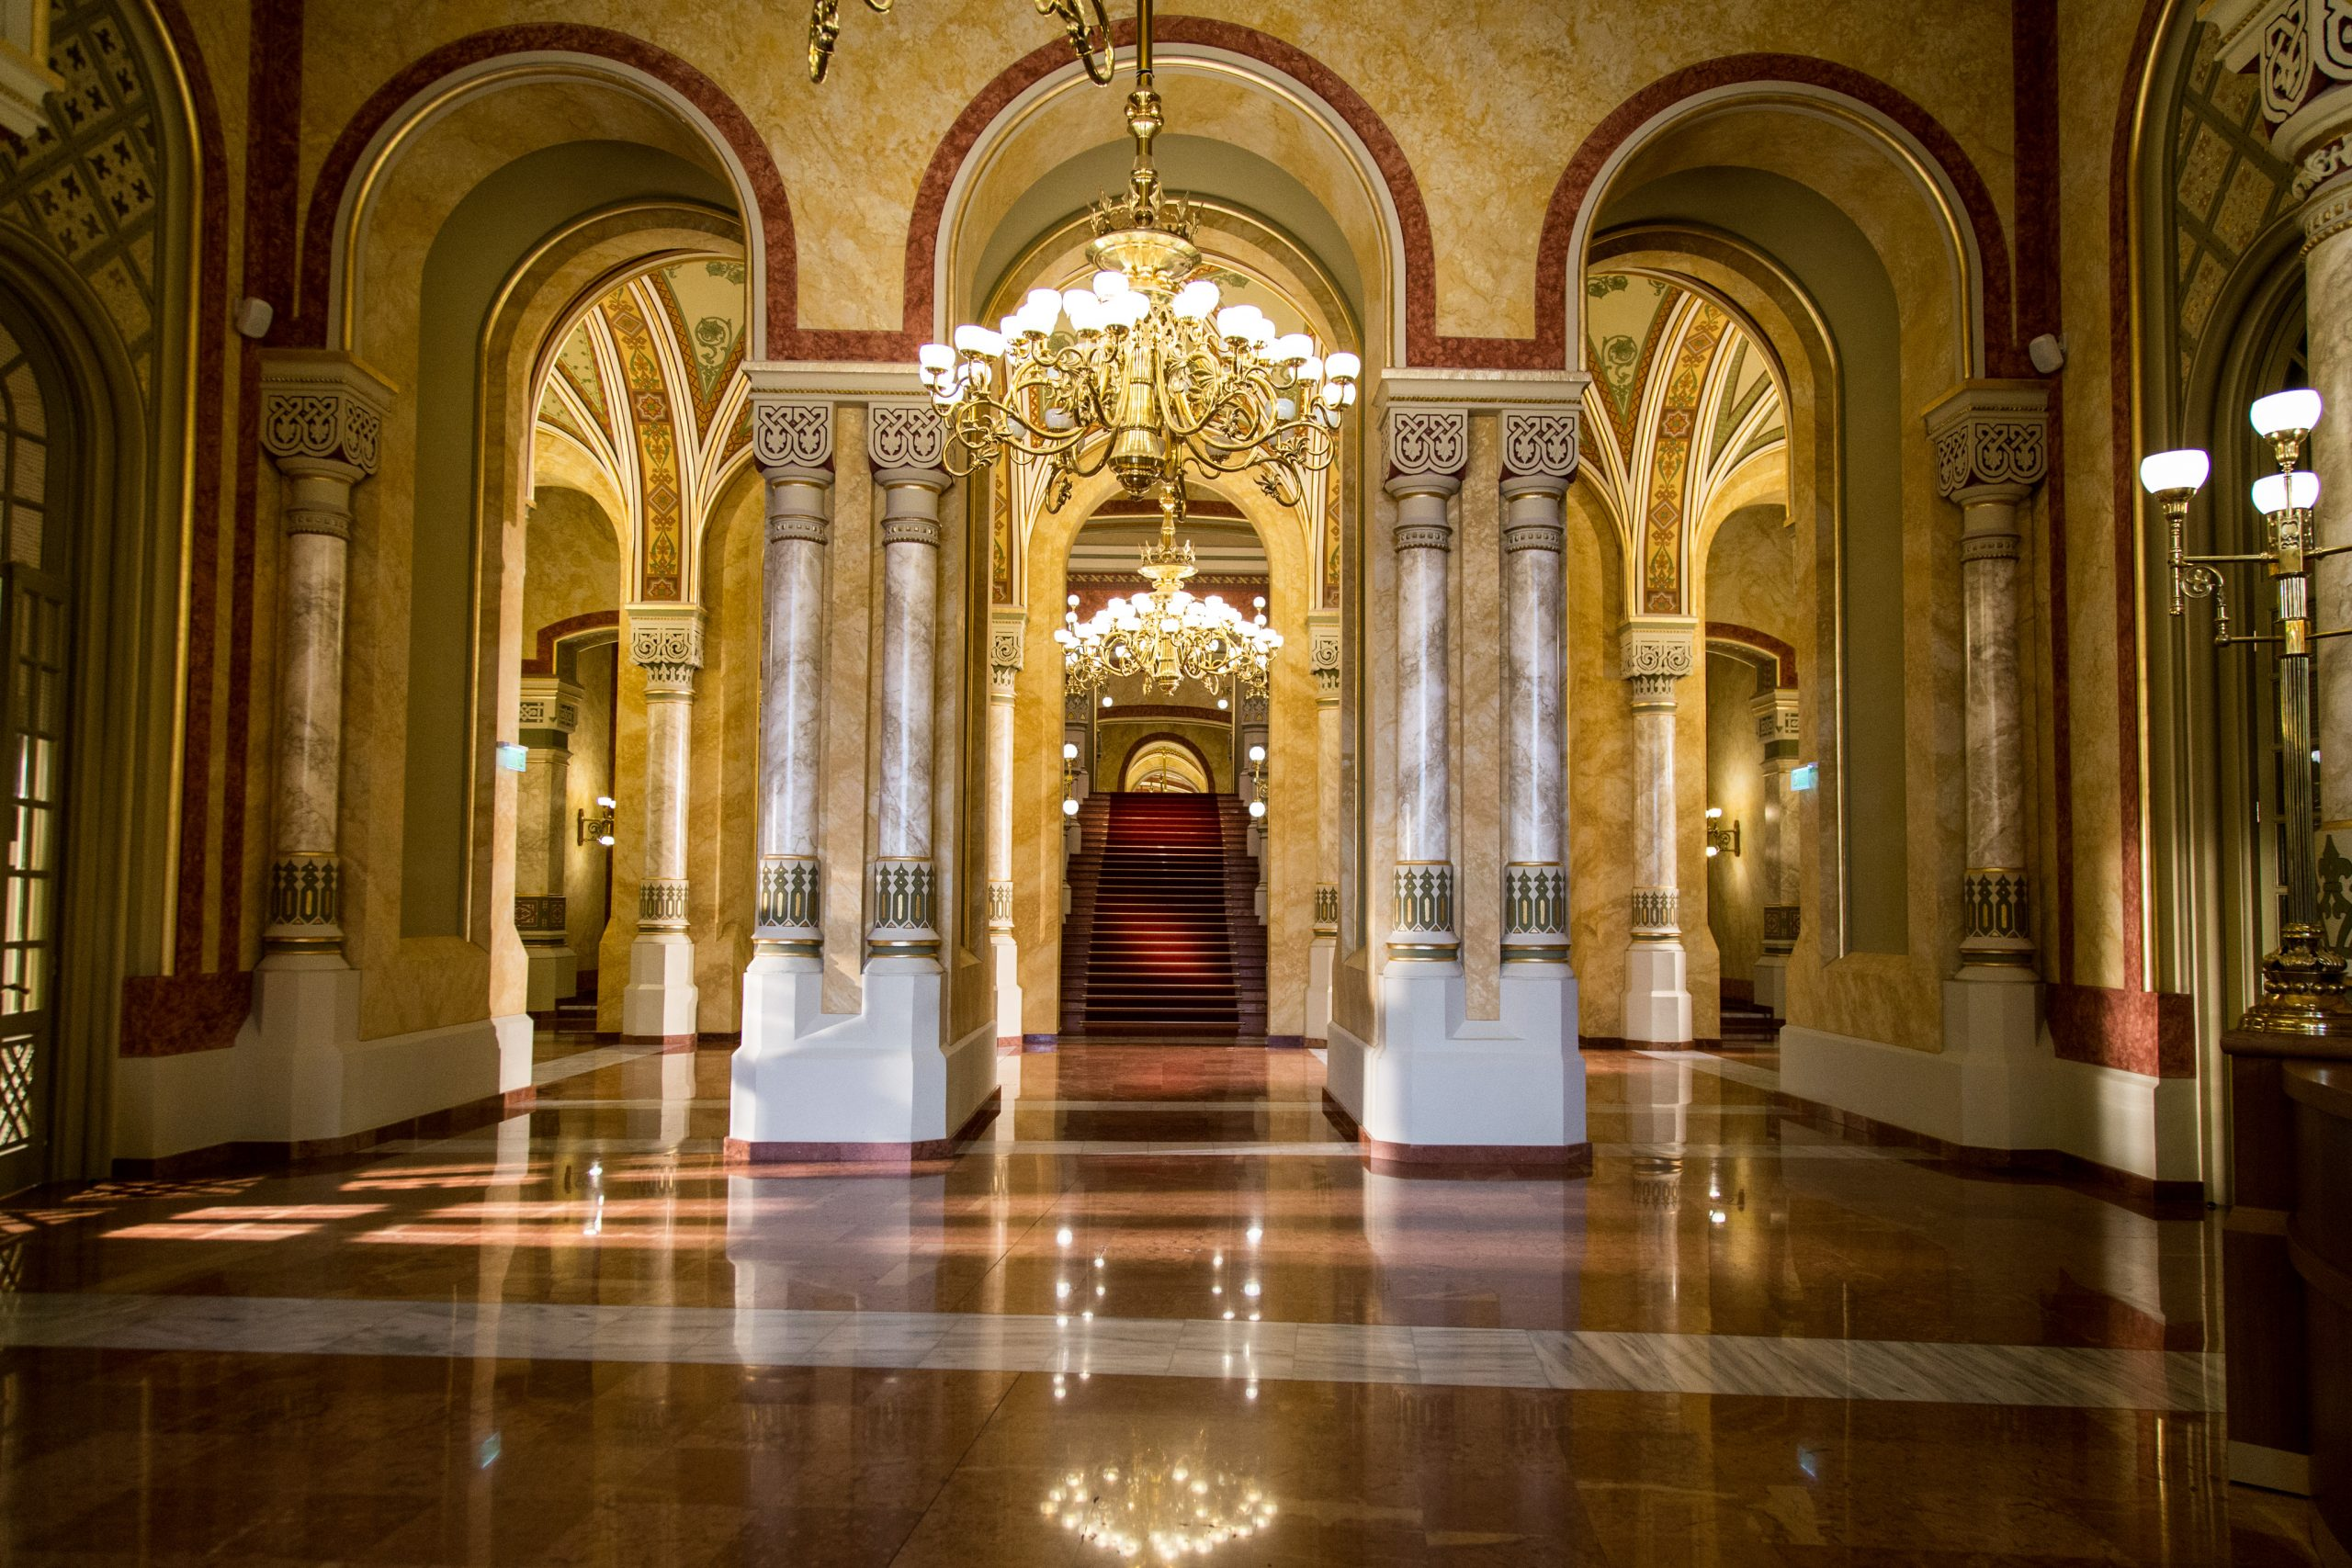 The entry hall of Vigado